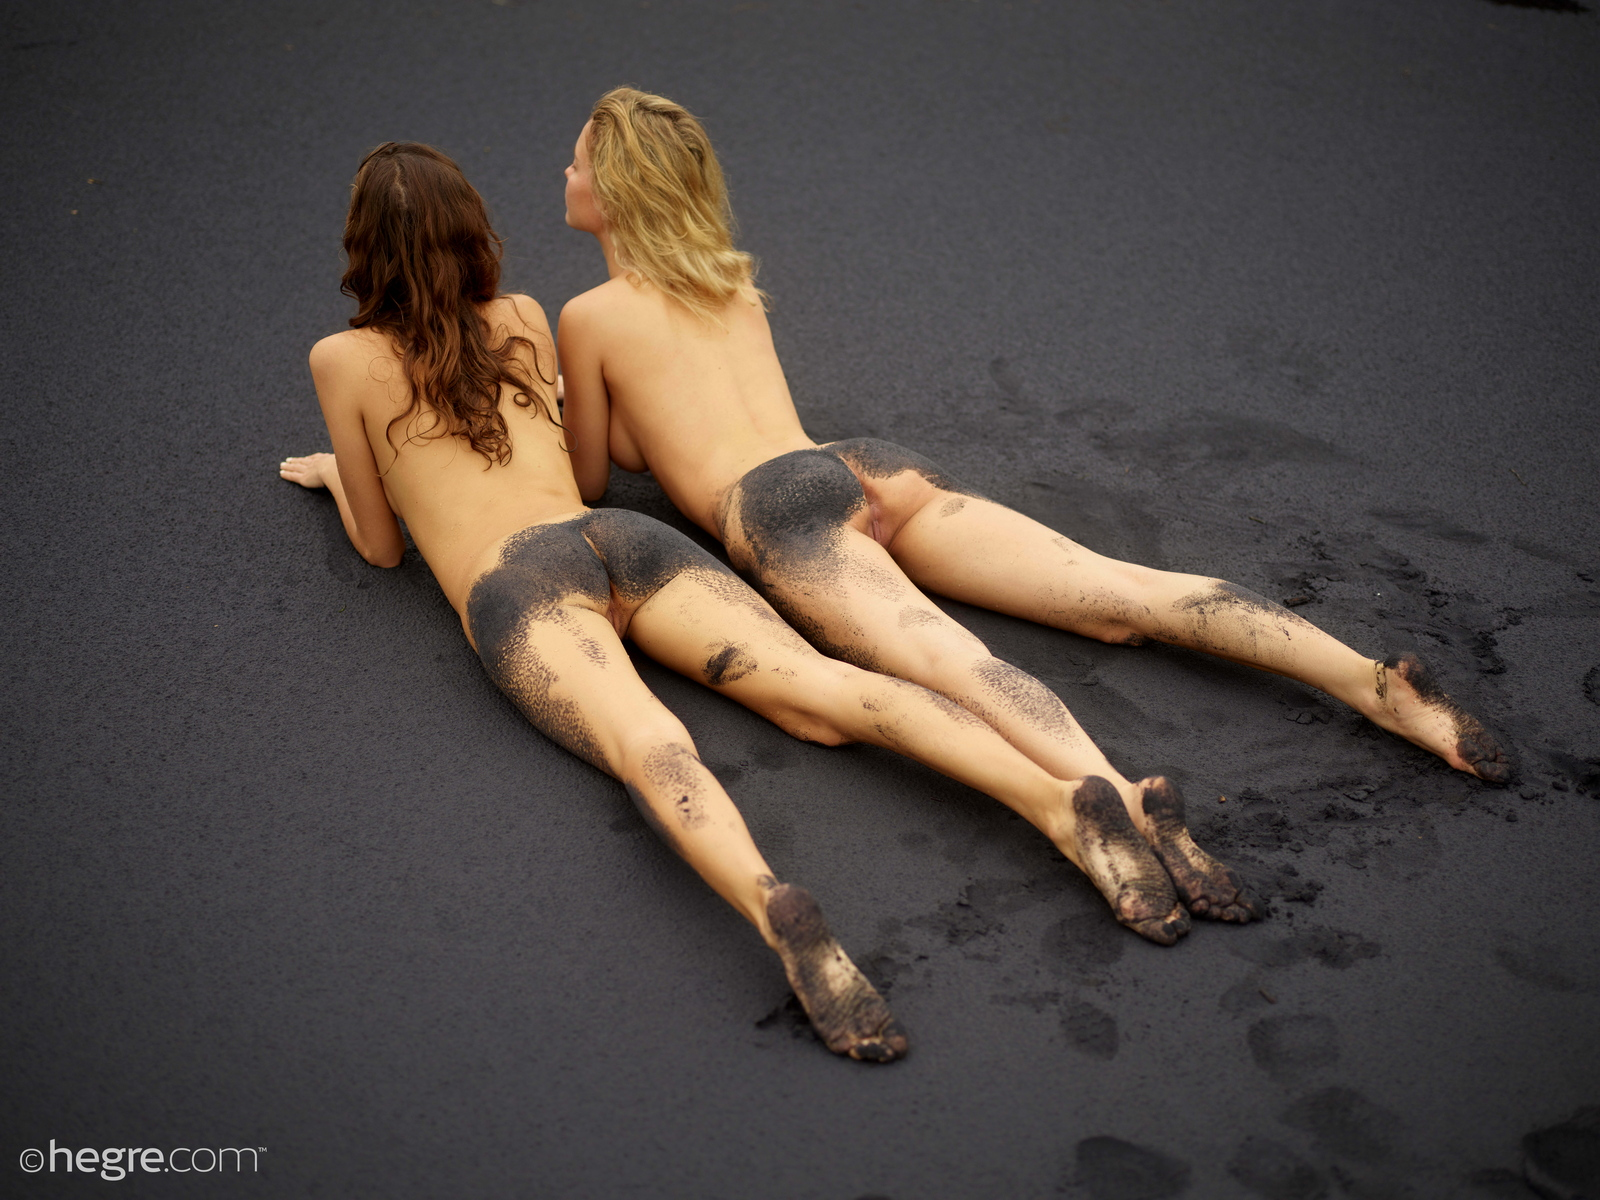 clover-natalia-a-nude-bali-beach-seaside-hegre-21